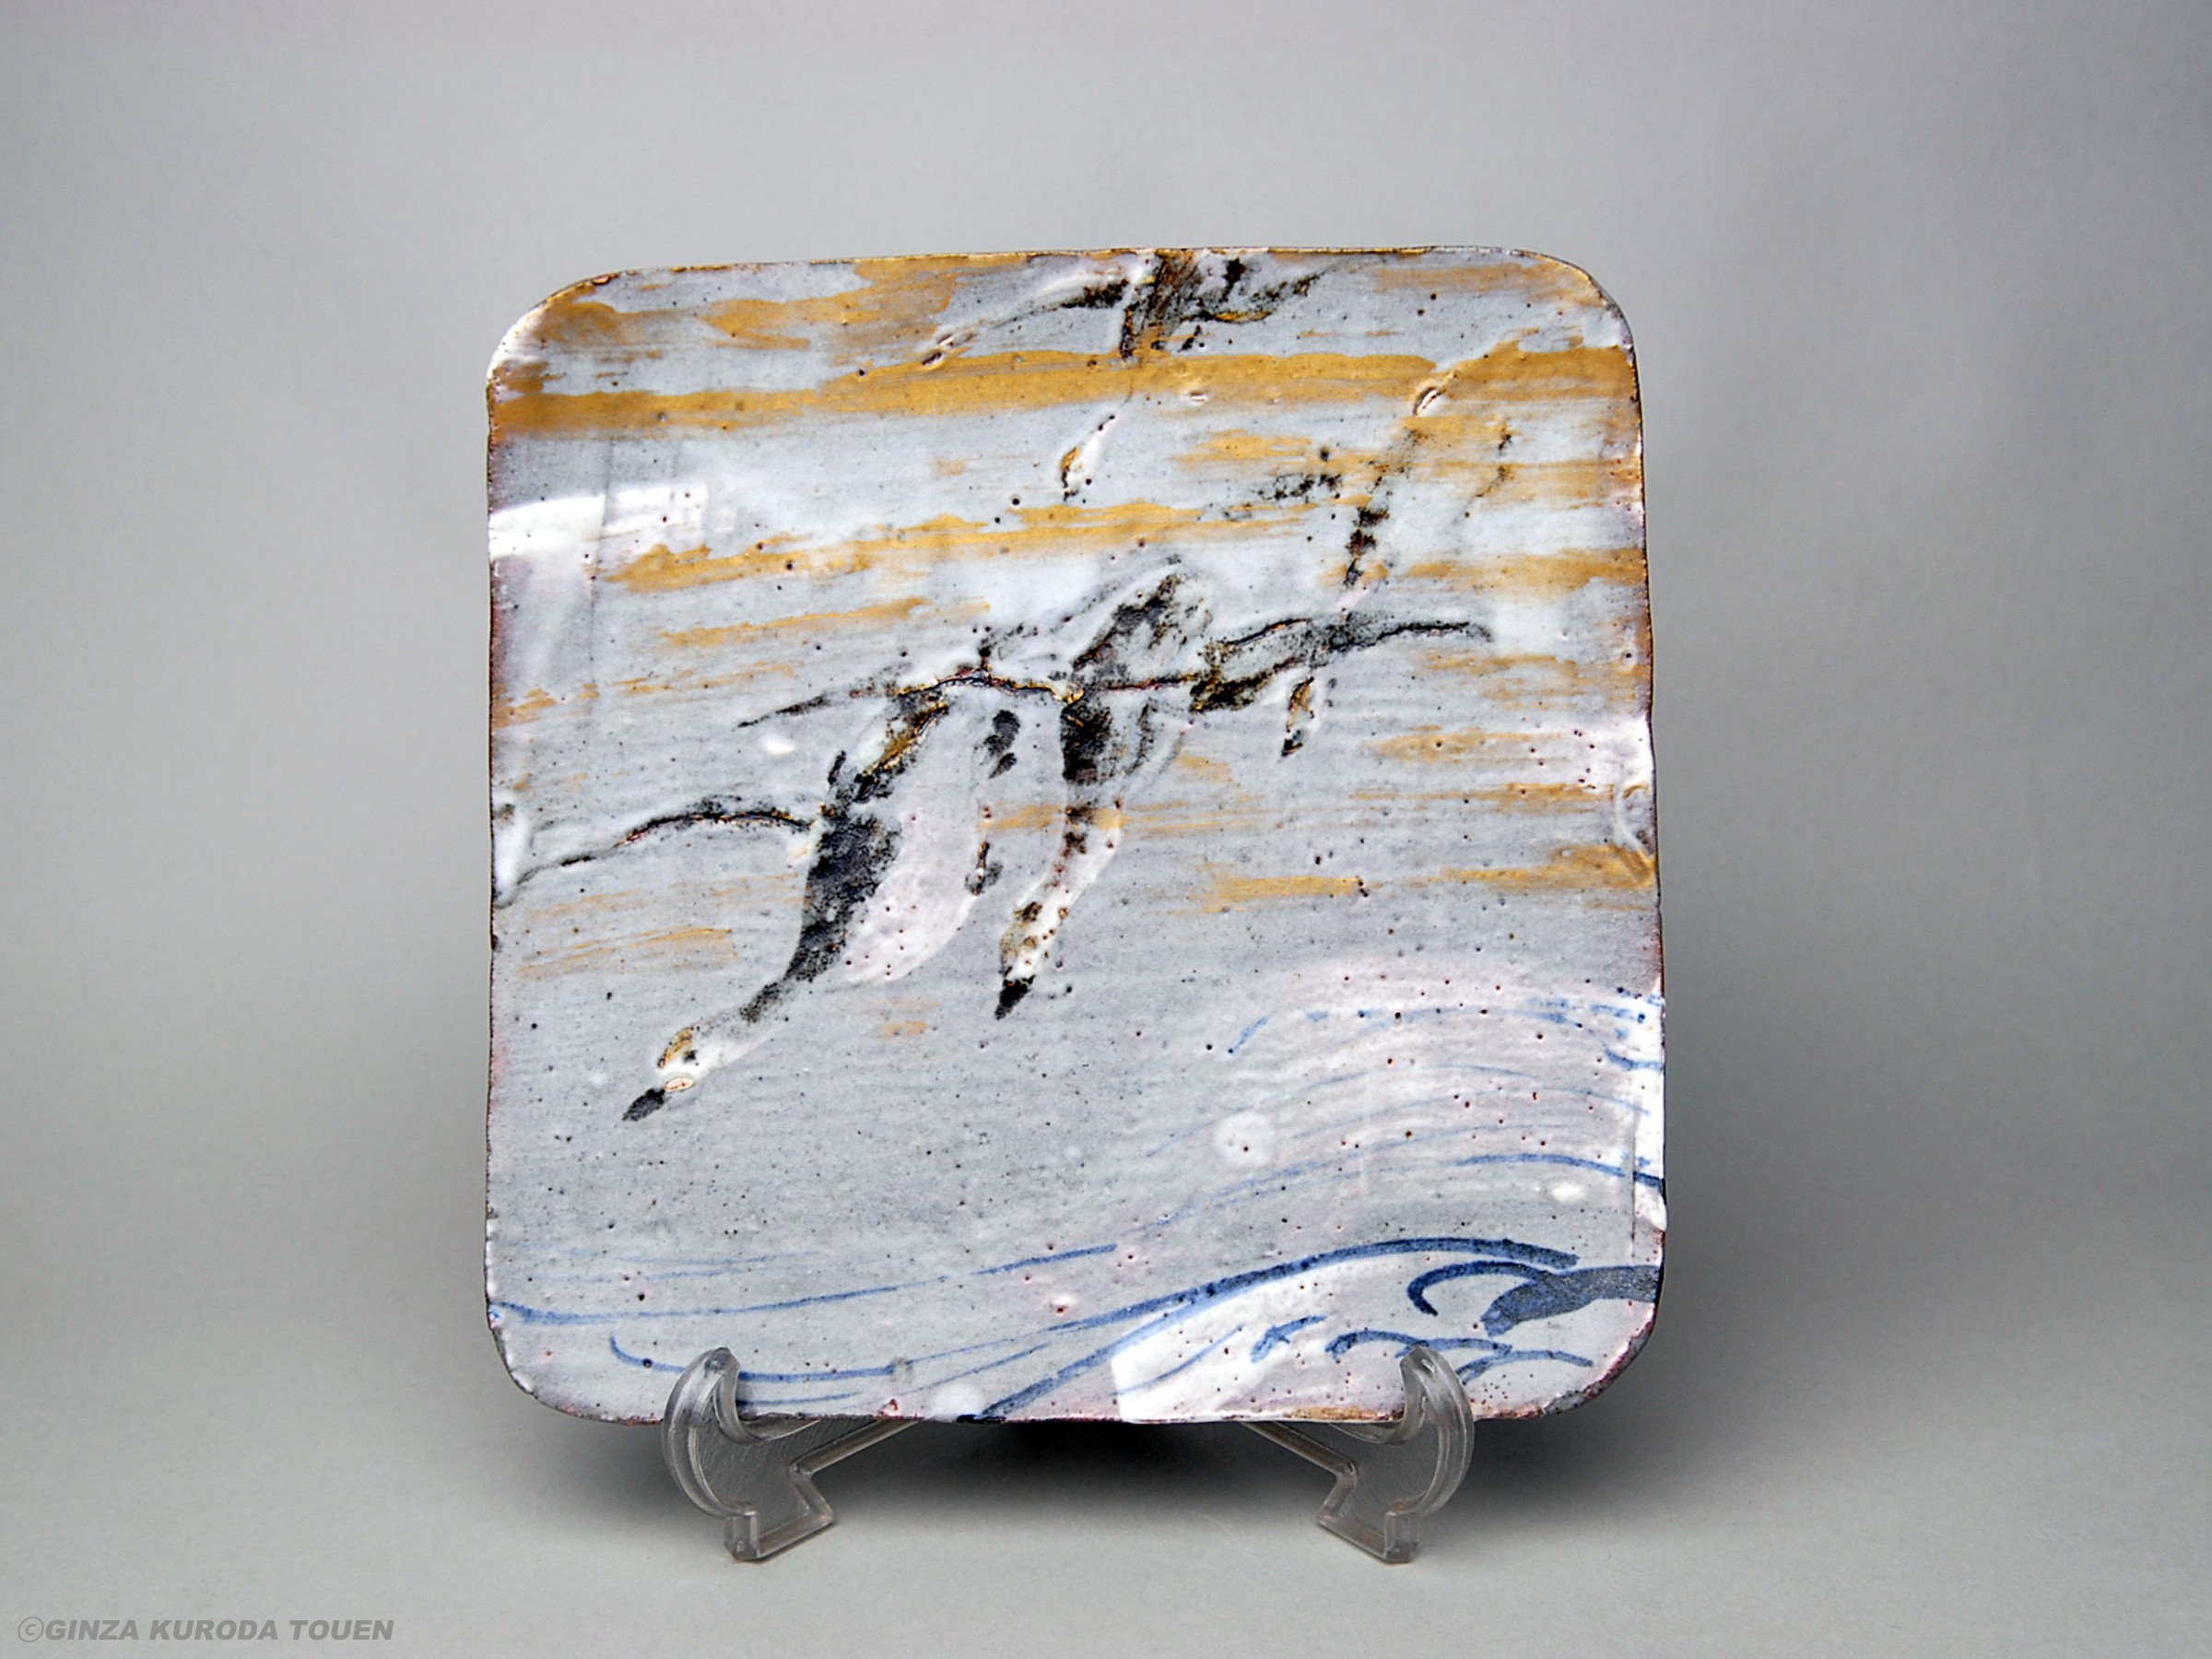 Toyozo Arakawa: Square plate, Wild goose design